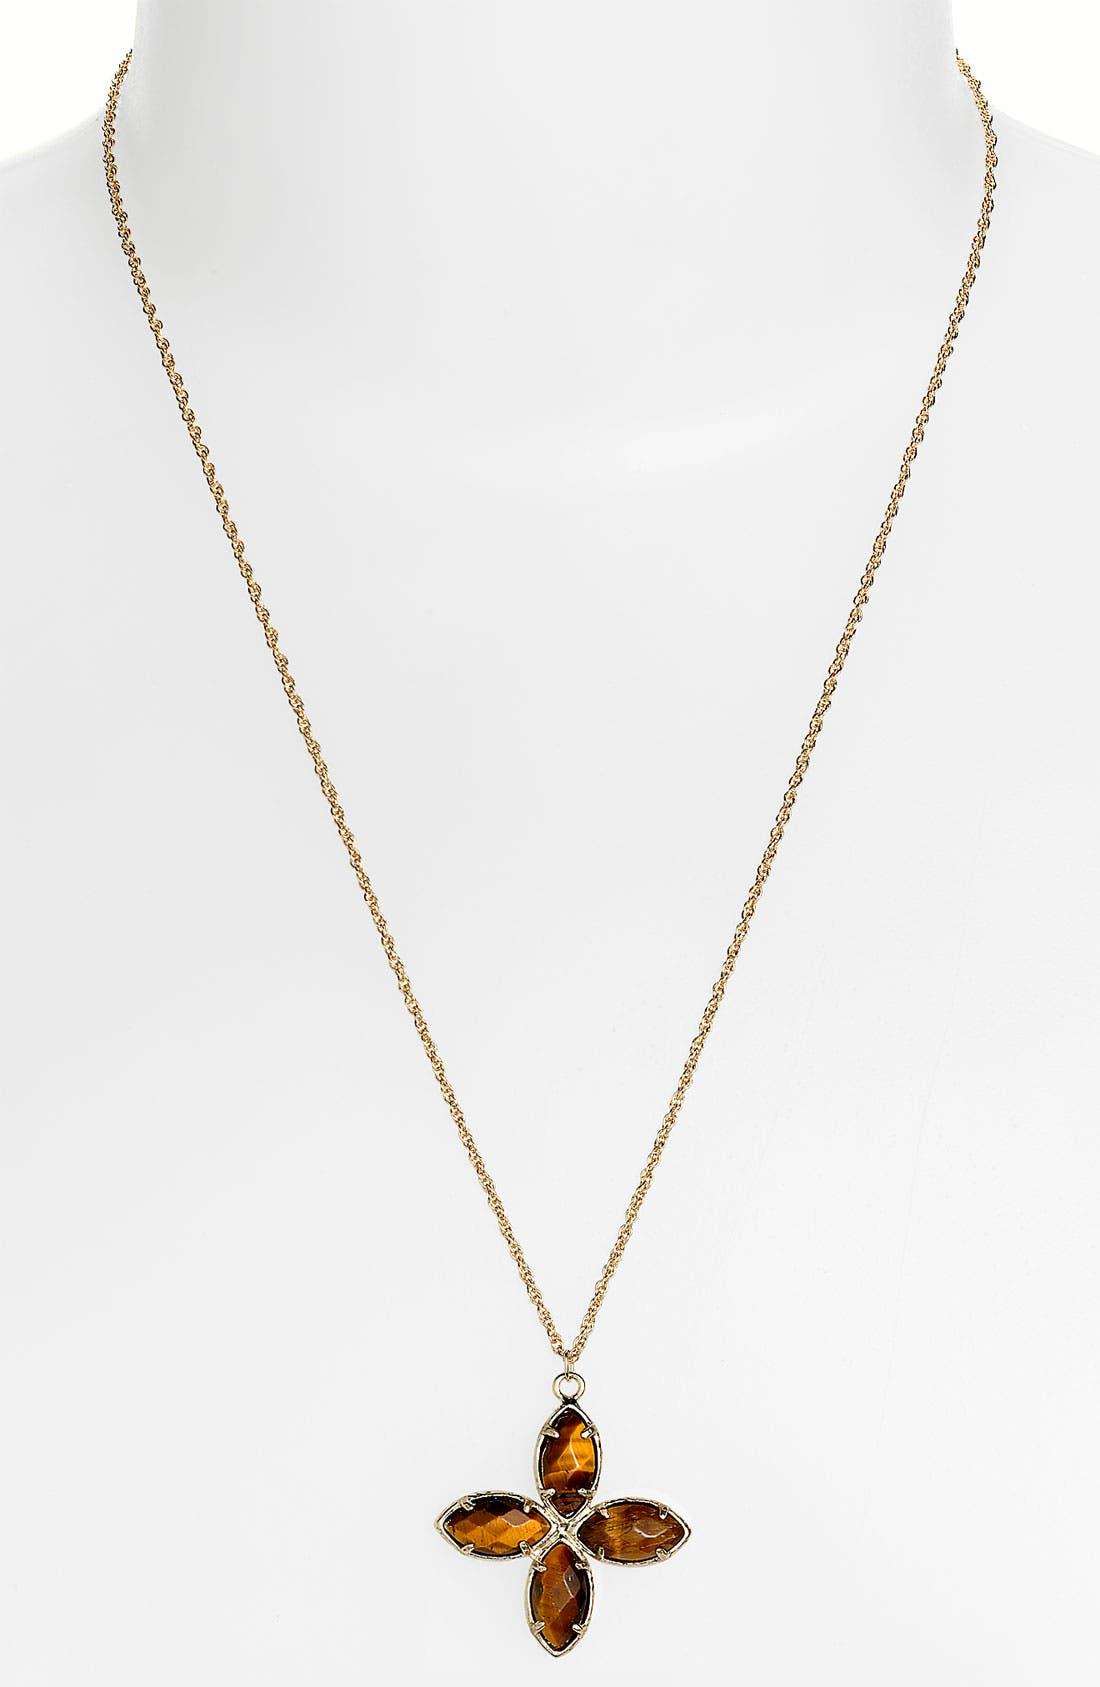 Alternate Image 1 Selected - Kendra Scott 'Thandi' Pendant Necklace